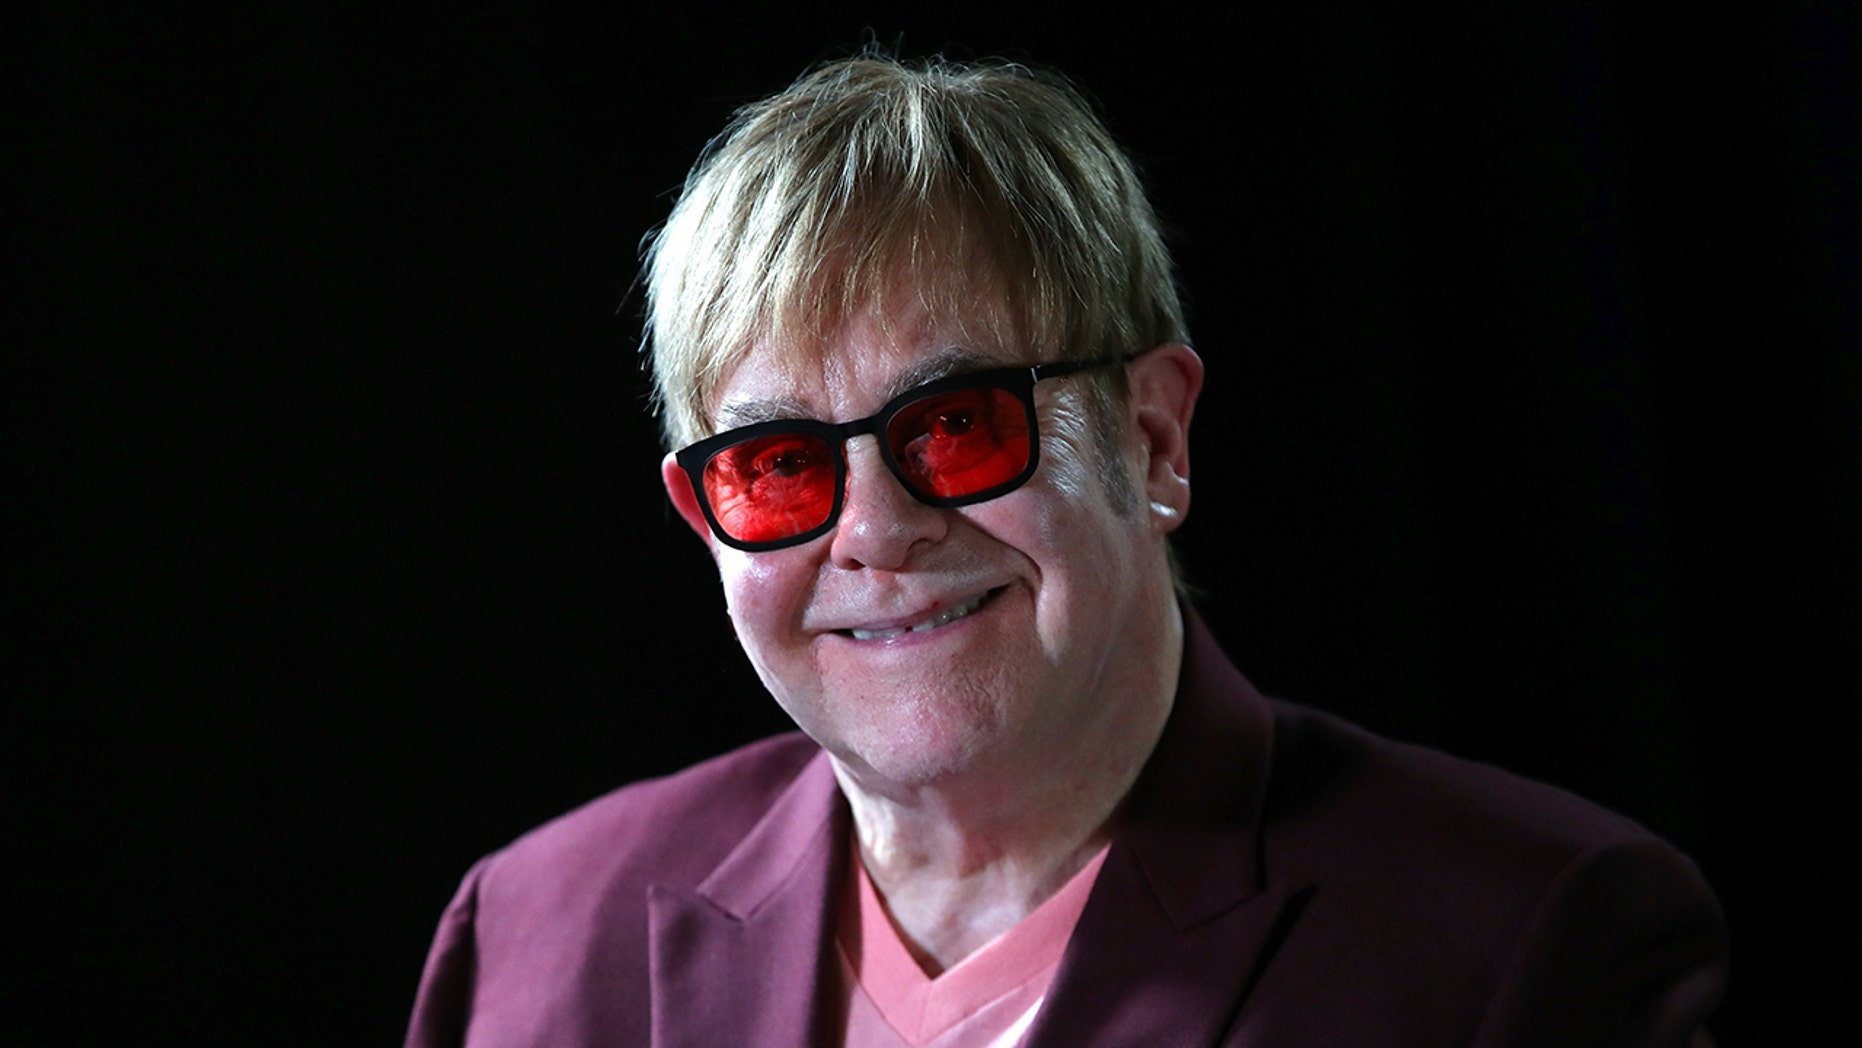 First trailer for Elton John biopic 'Rocketman' drops